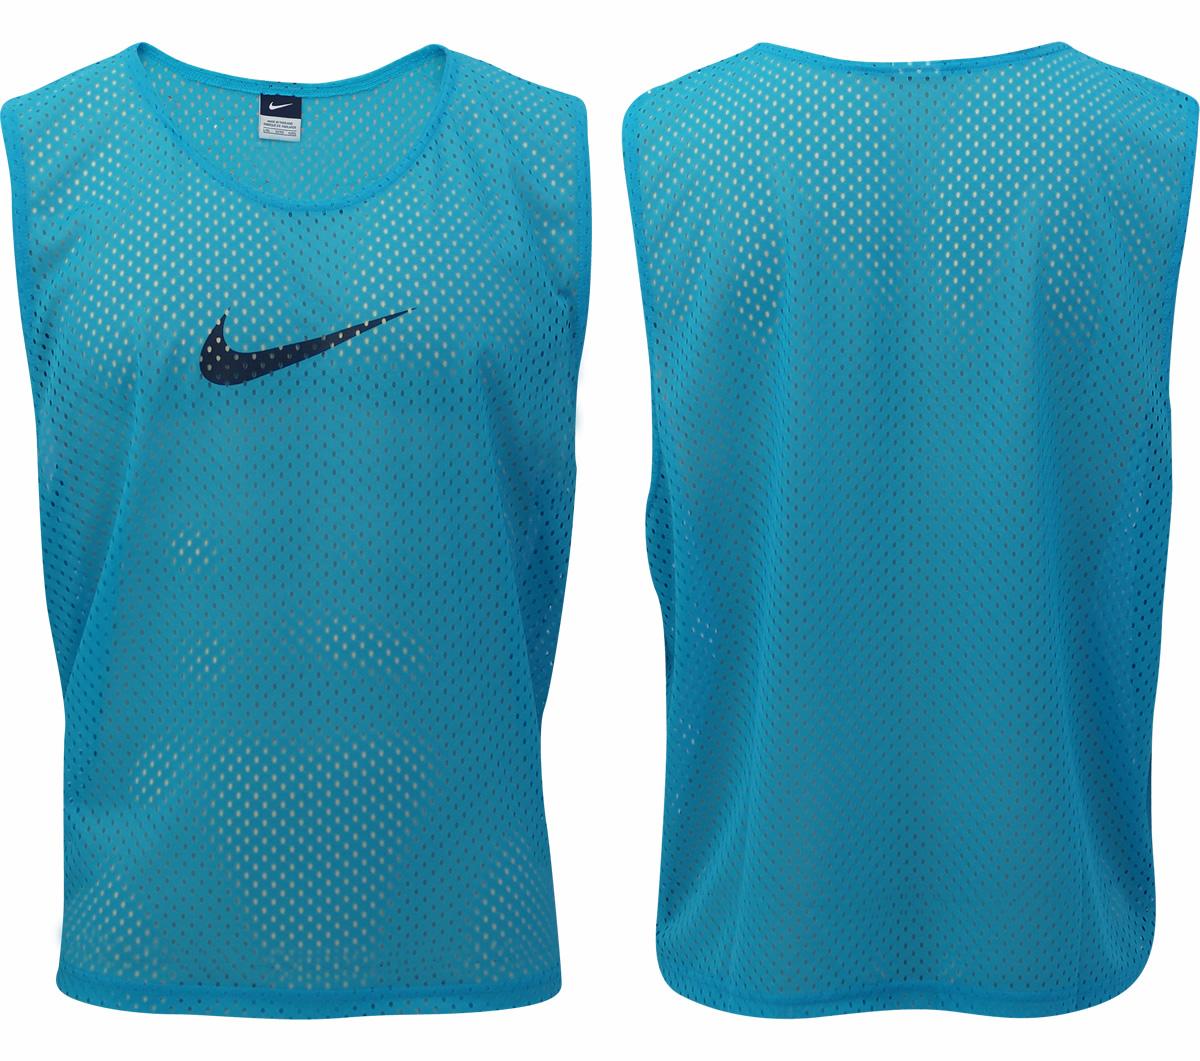 57619e68c6367a Colete Nike Swoosh Azul Colete Nike Swoosh Azul